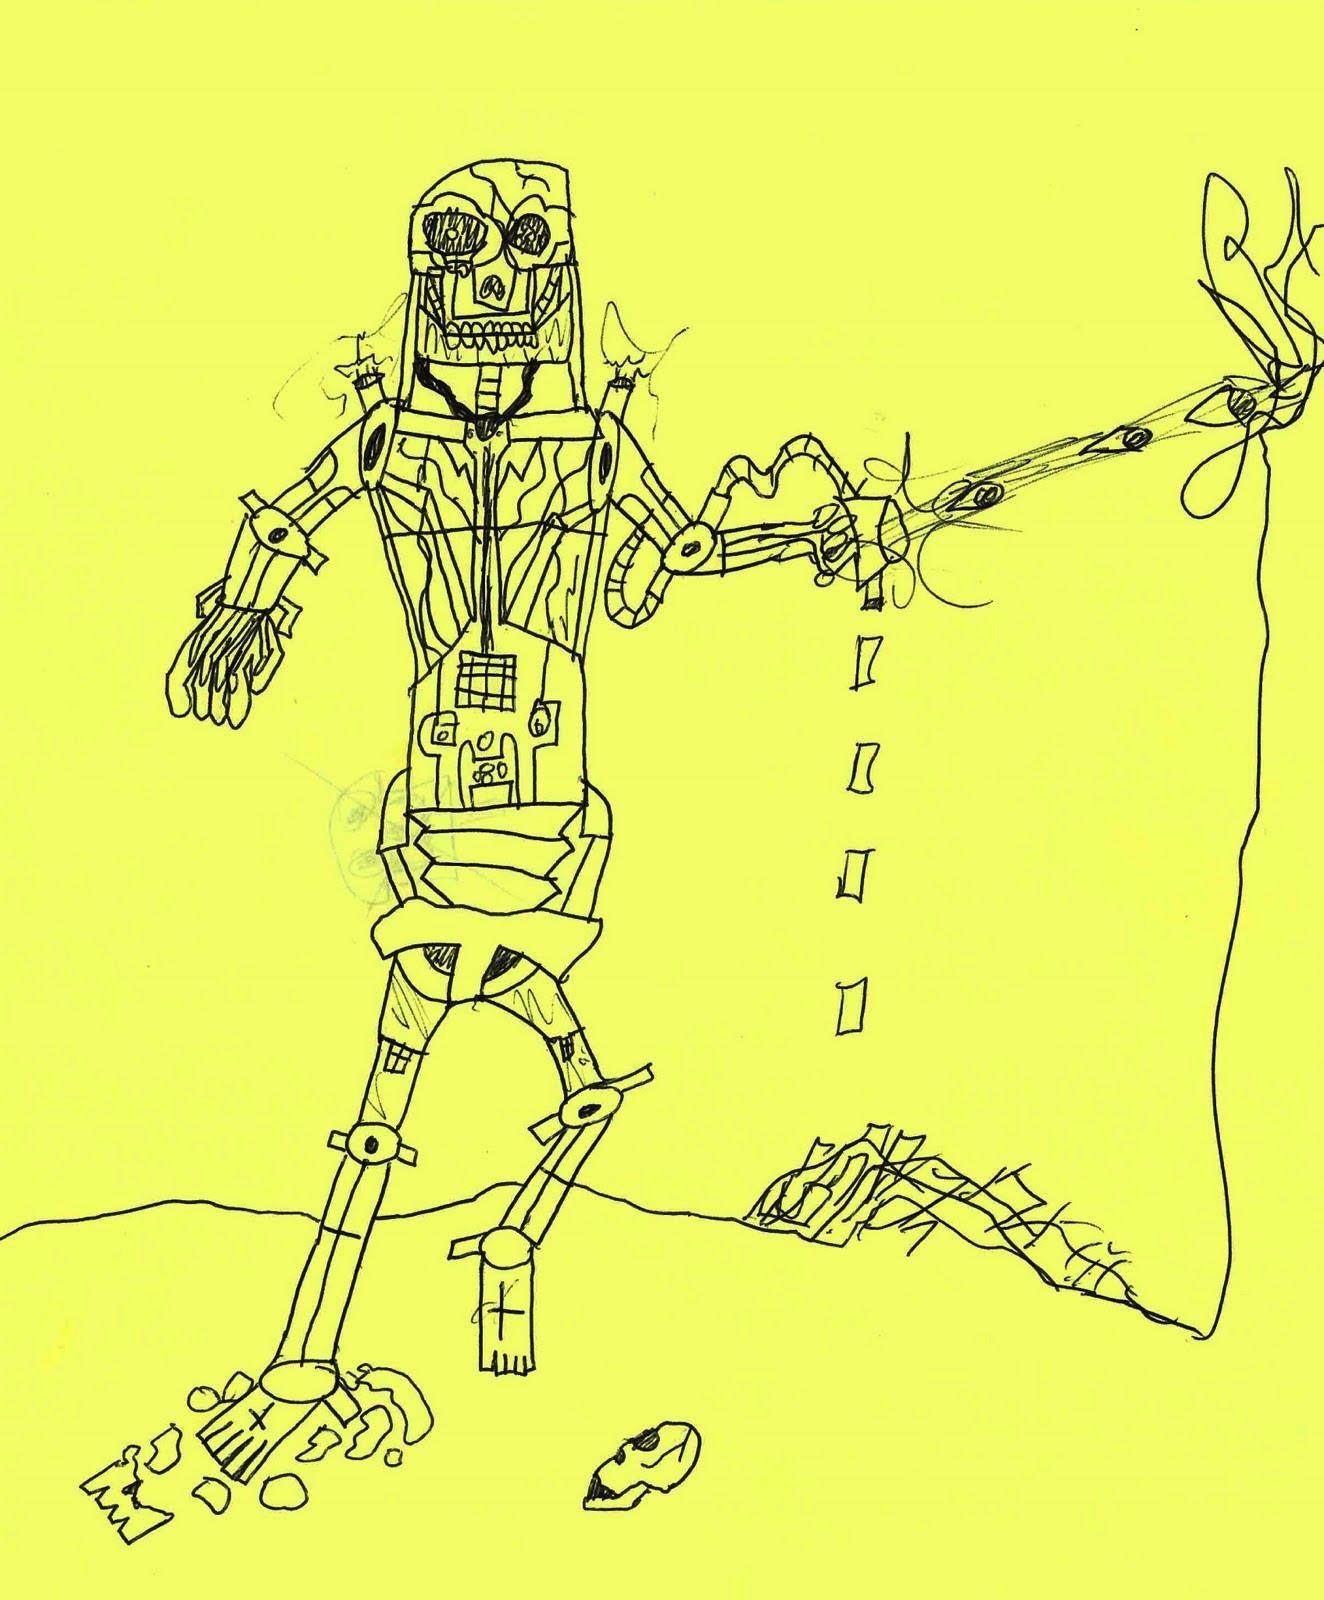 http://4.bp.blogspot.com/_wy7z7lPAApo/TDZx72e0qlI/AAAAAAAABbE/9AObF8GBToY/s1600/terminator.jpg